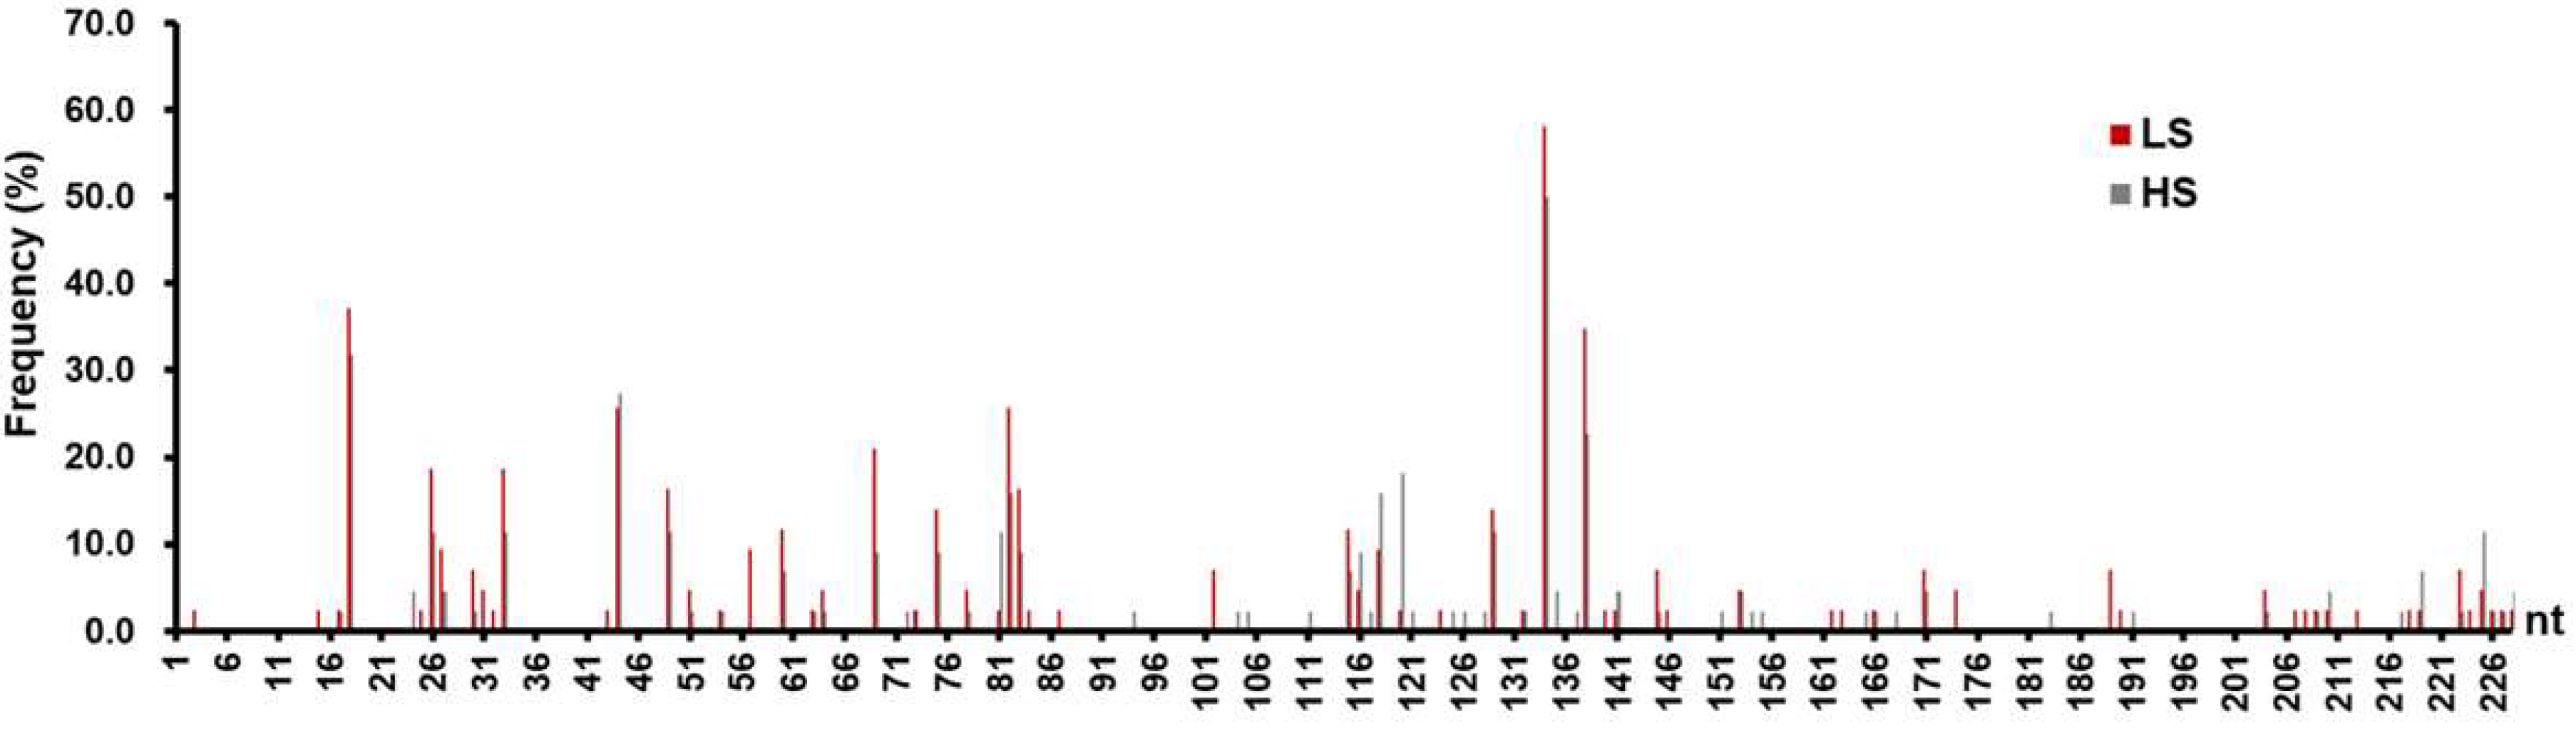 Viruses | Free Full-Text | Naturally Occurring Mutations